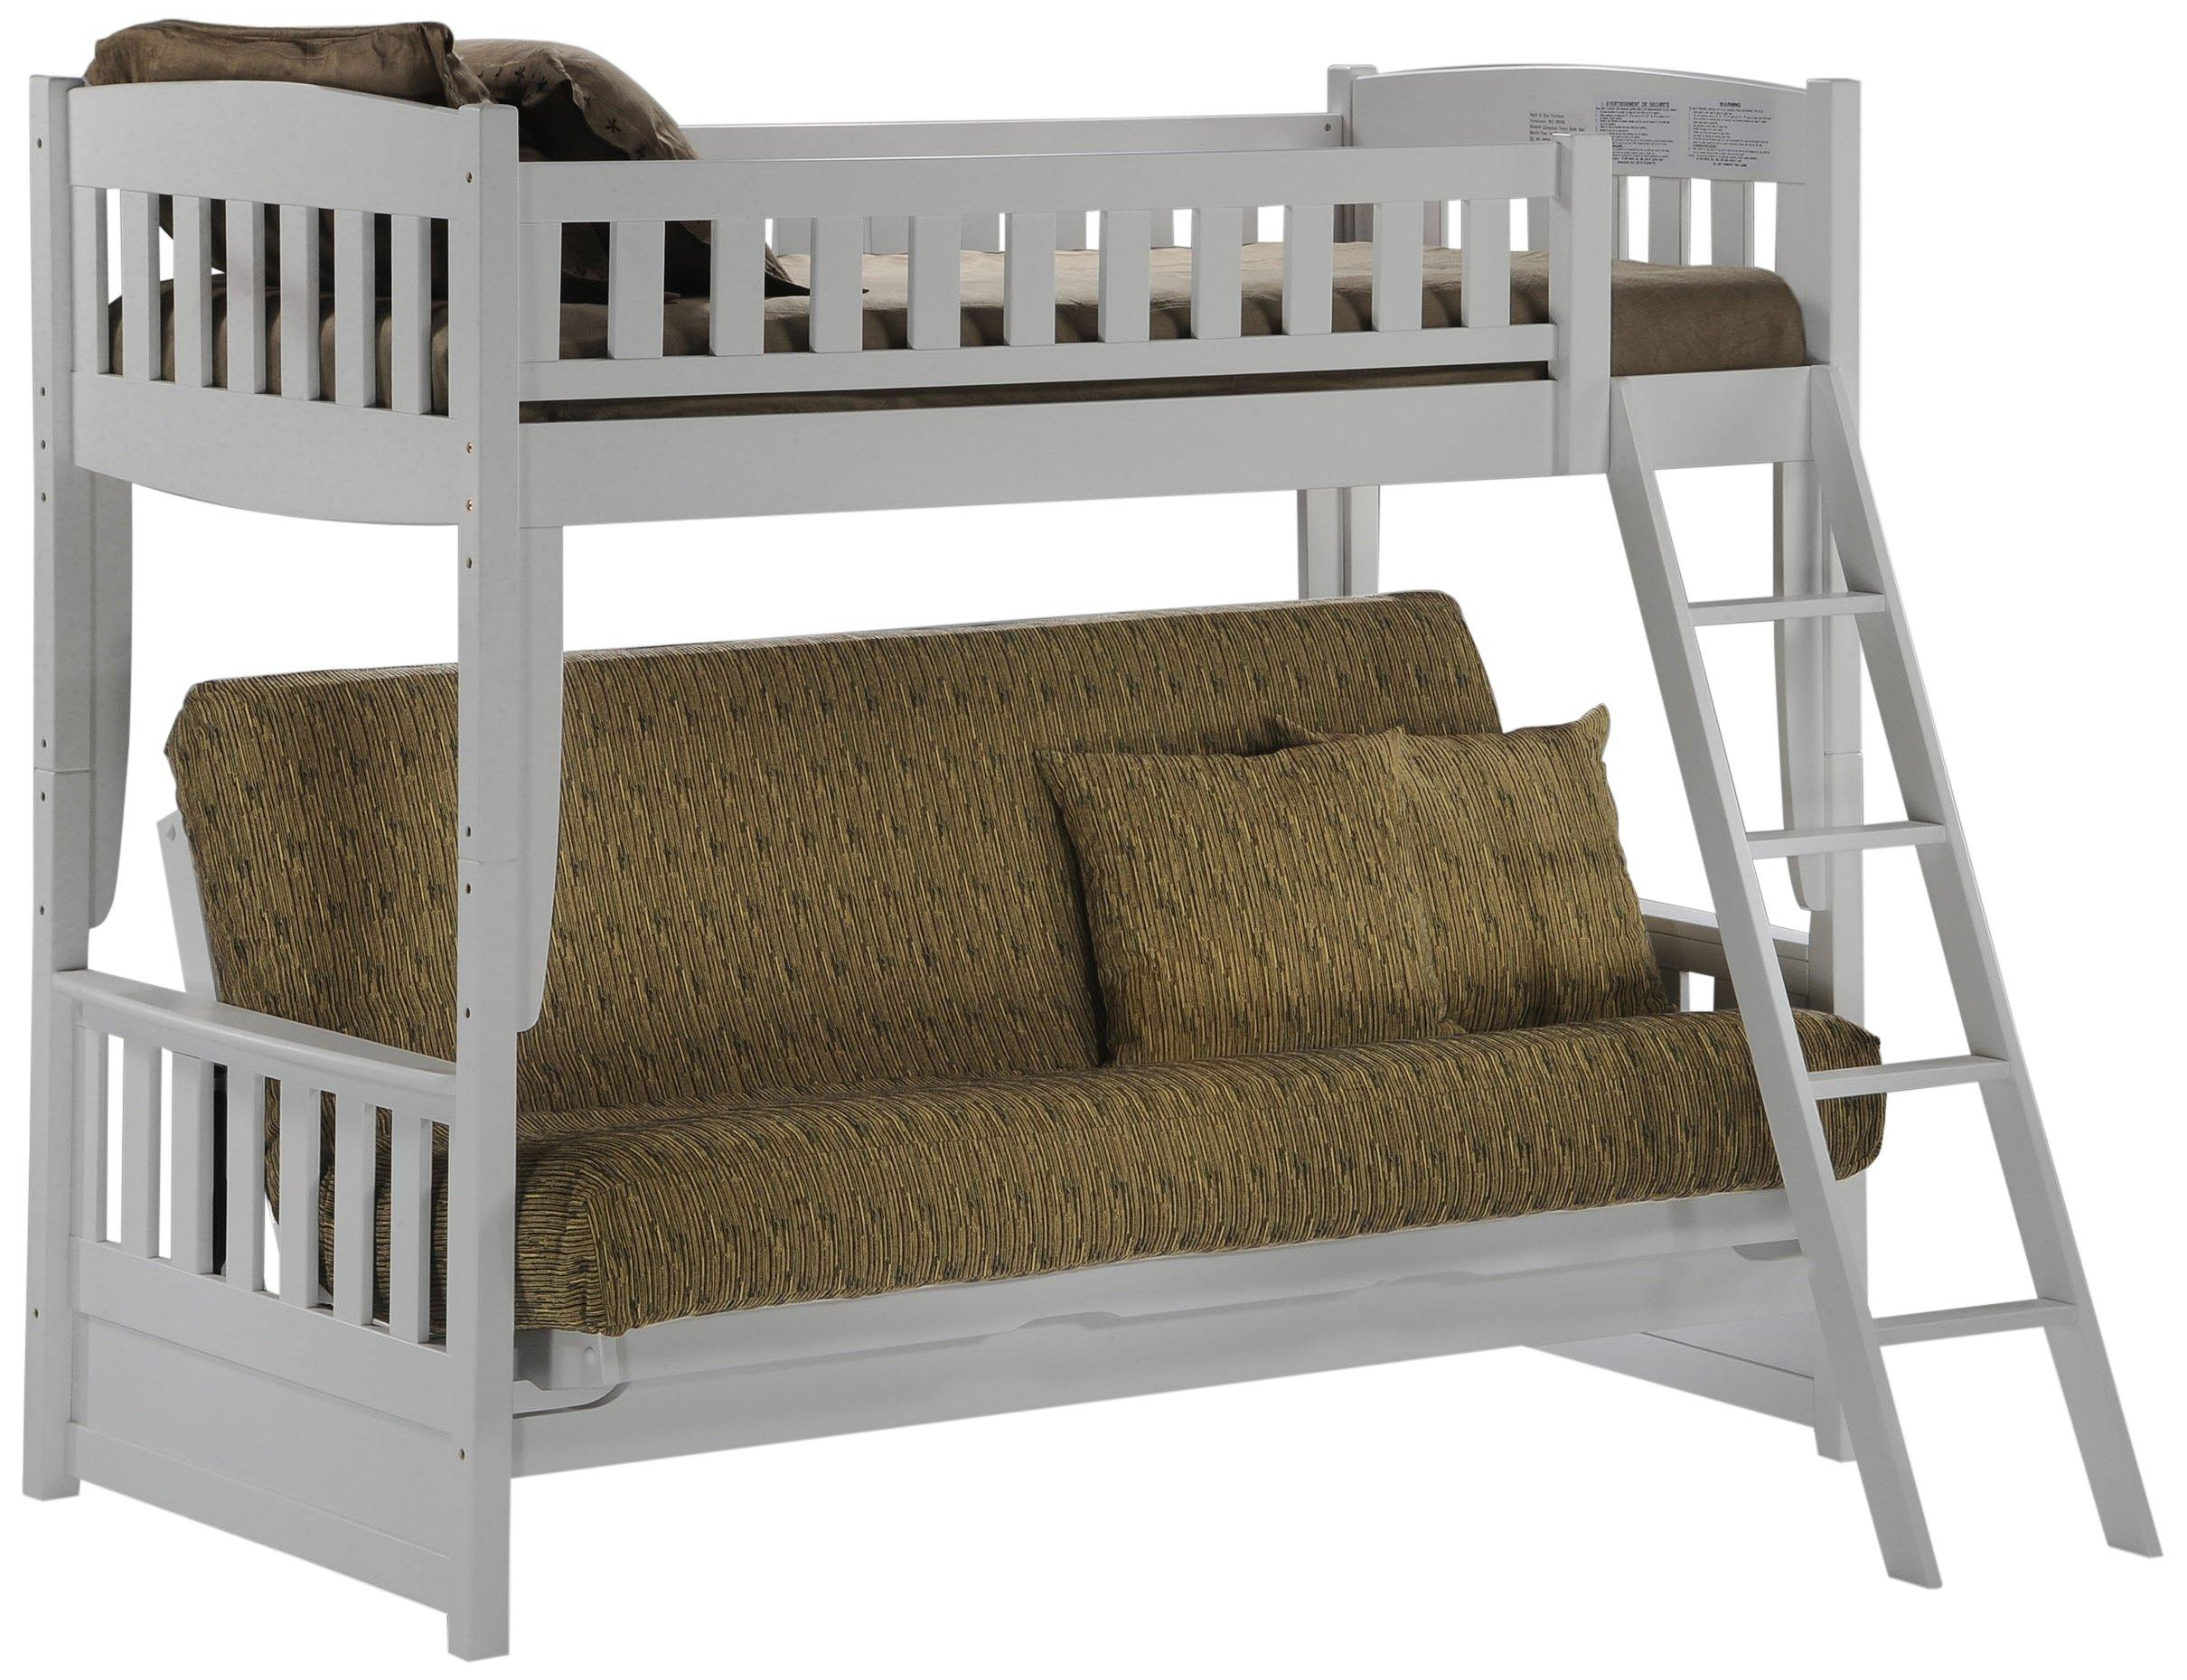 Night & Day Furniture Cinnamon Futon Bunk, White Finish by Night & Day Furniture